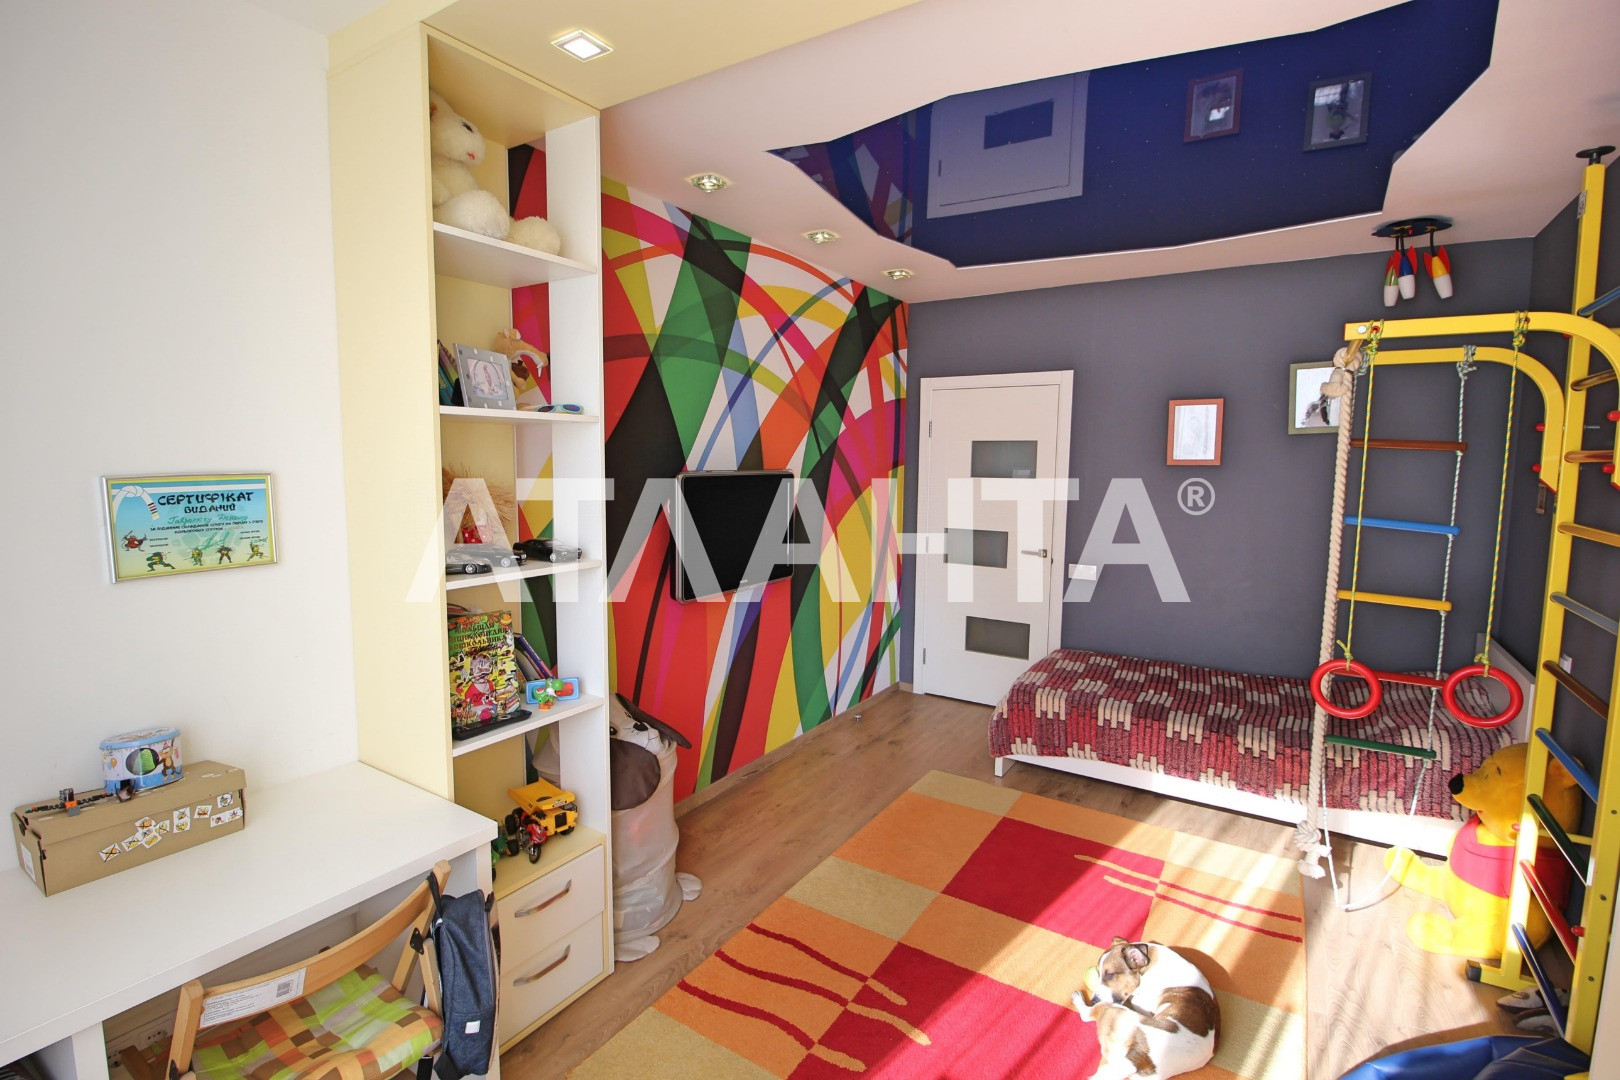 Продается 4-комнатная Квартира на ул. Ул. Богатырская — 175 000 у.е. (фото №6)